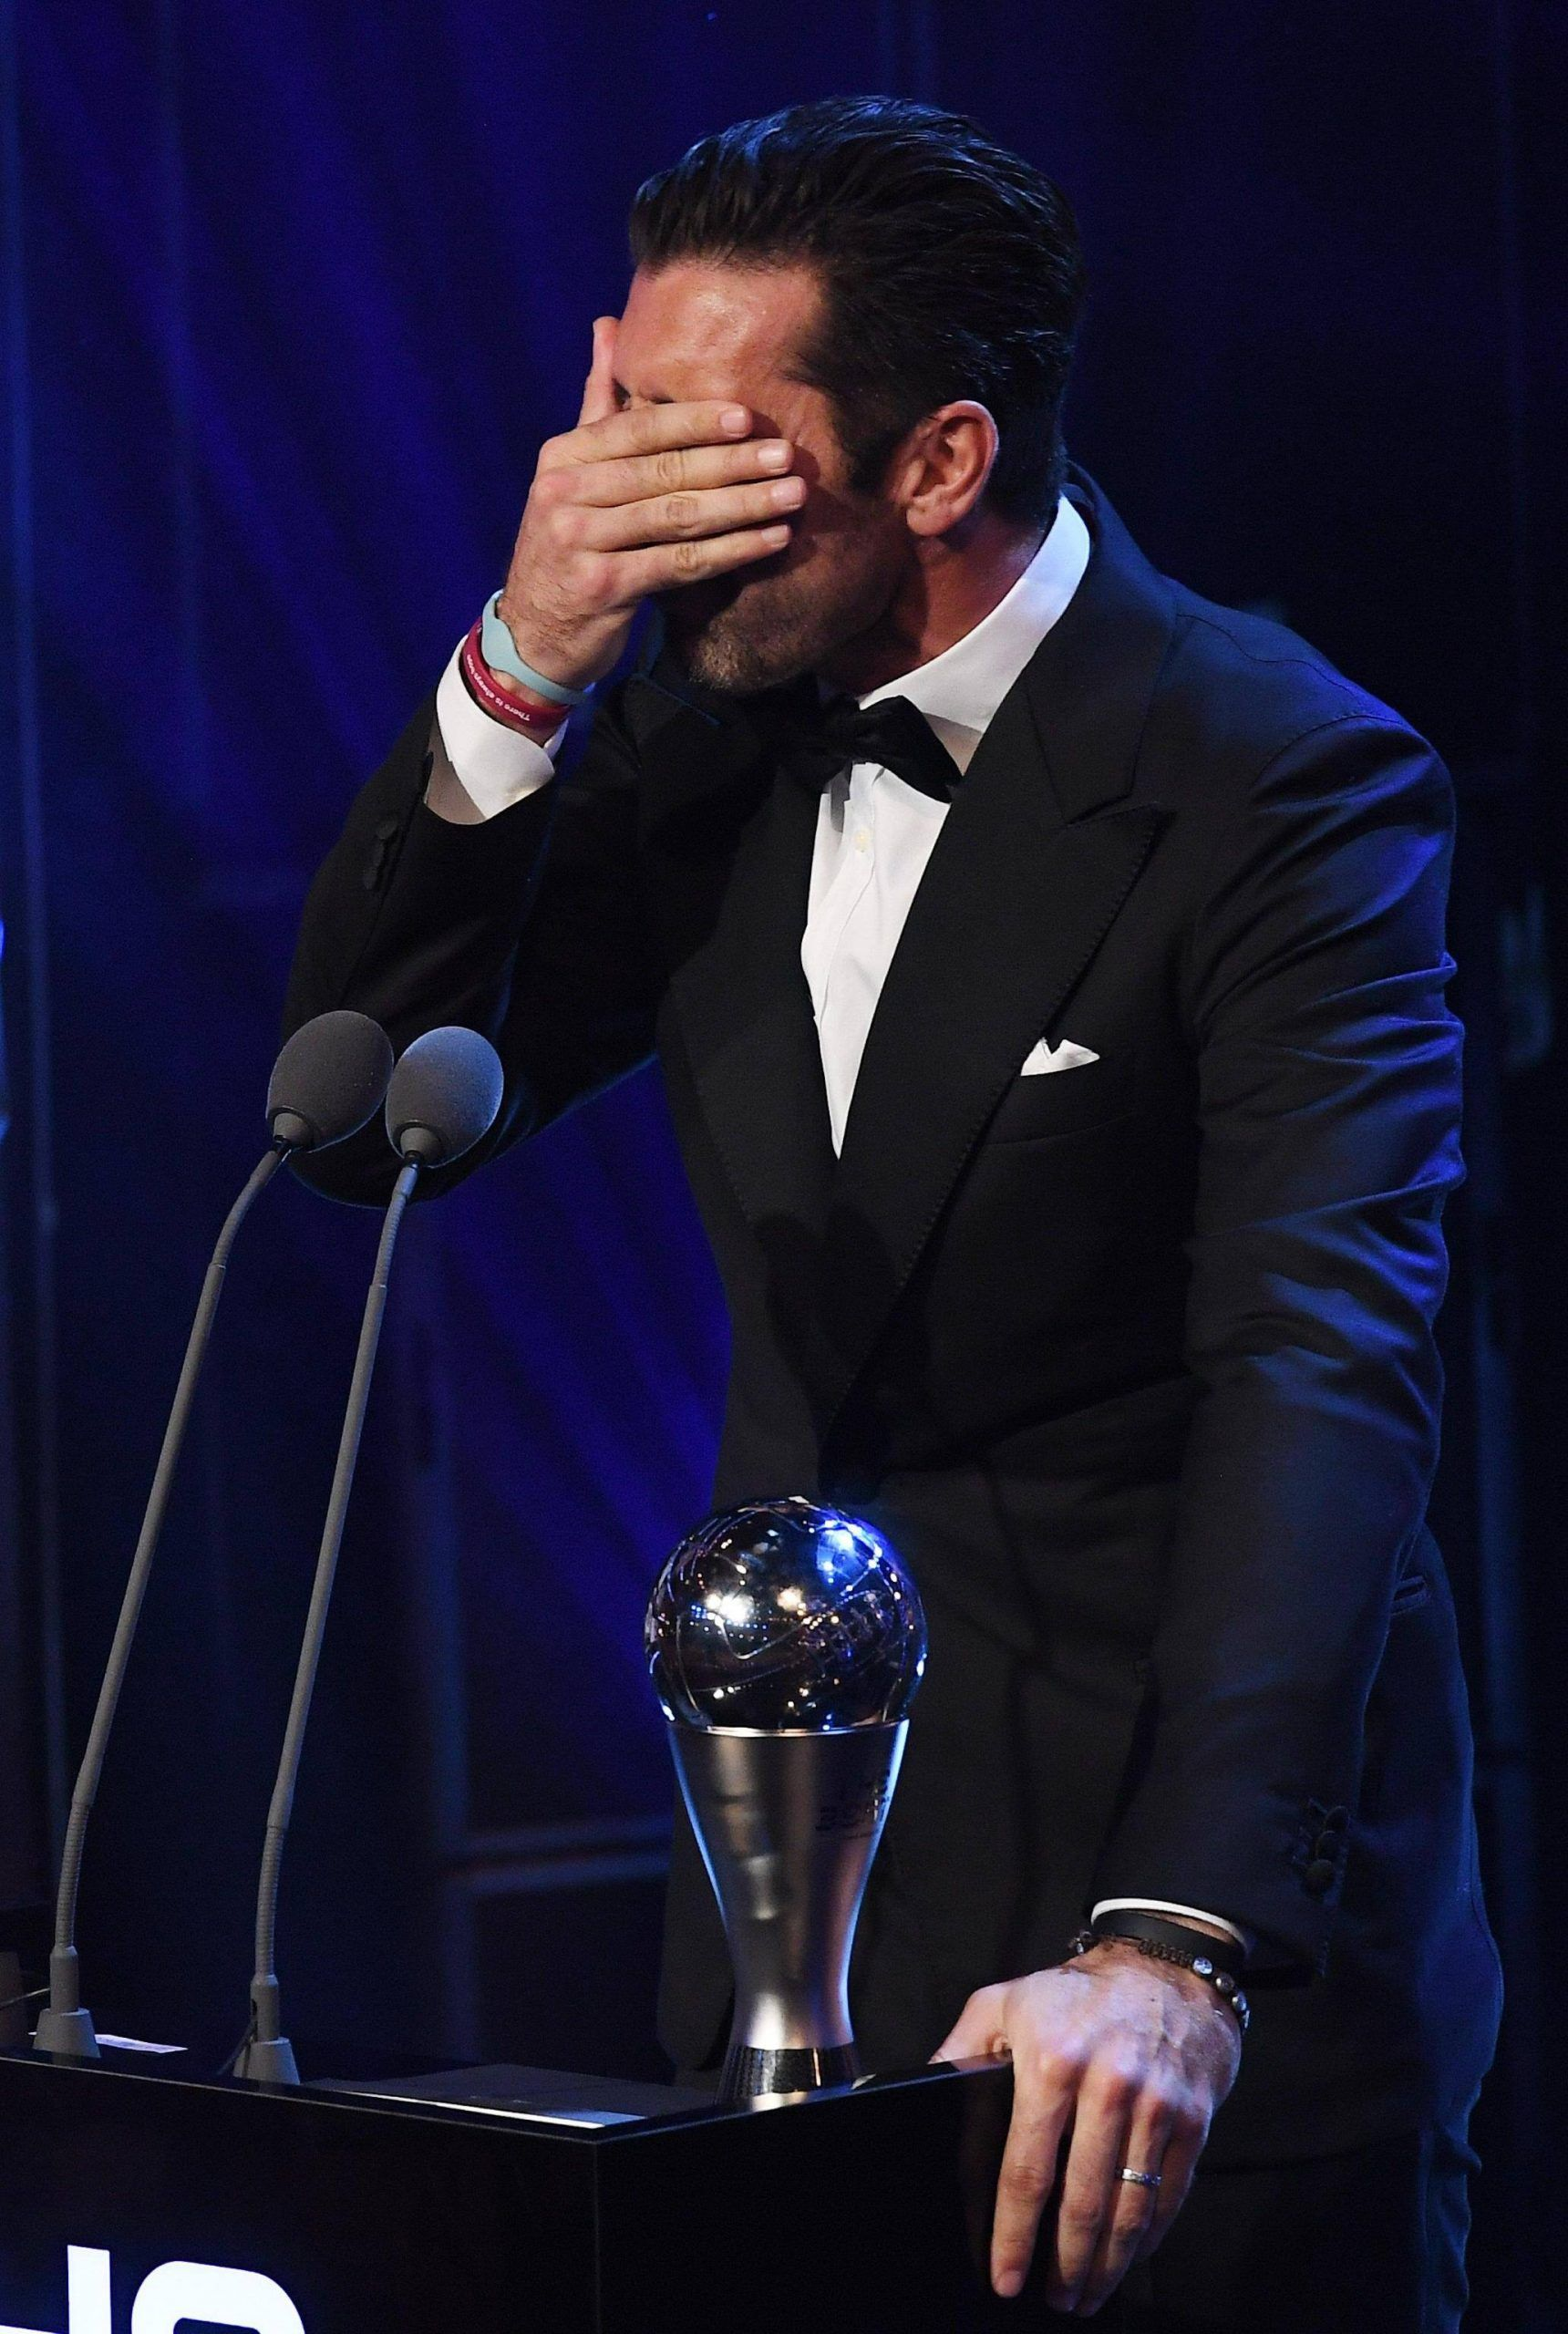 The Best FIFA Football Awards 2017 - Buffon